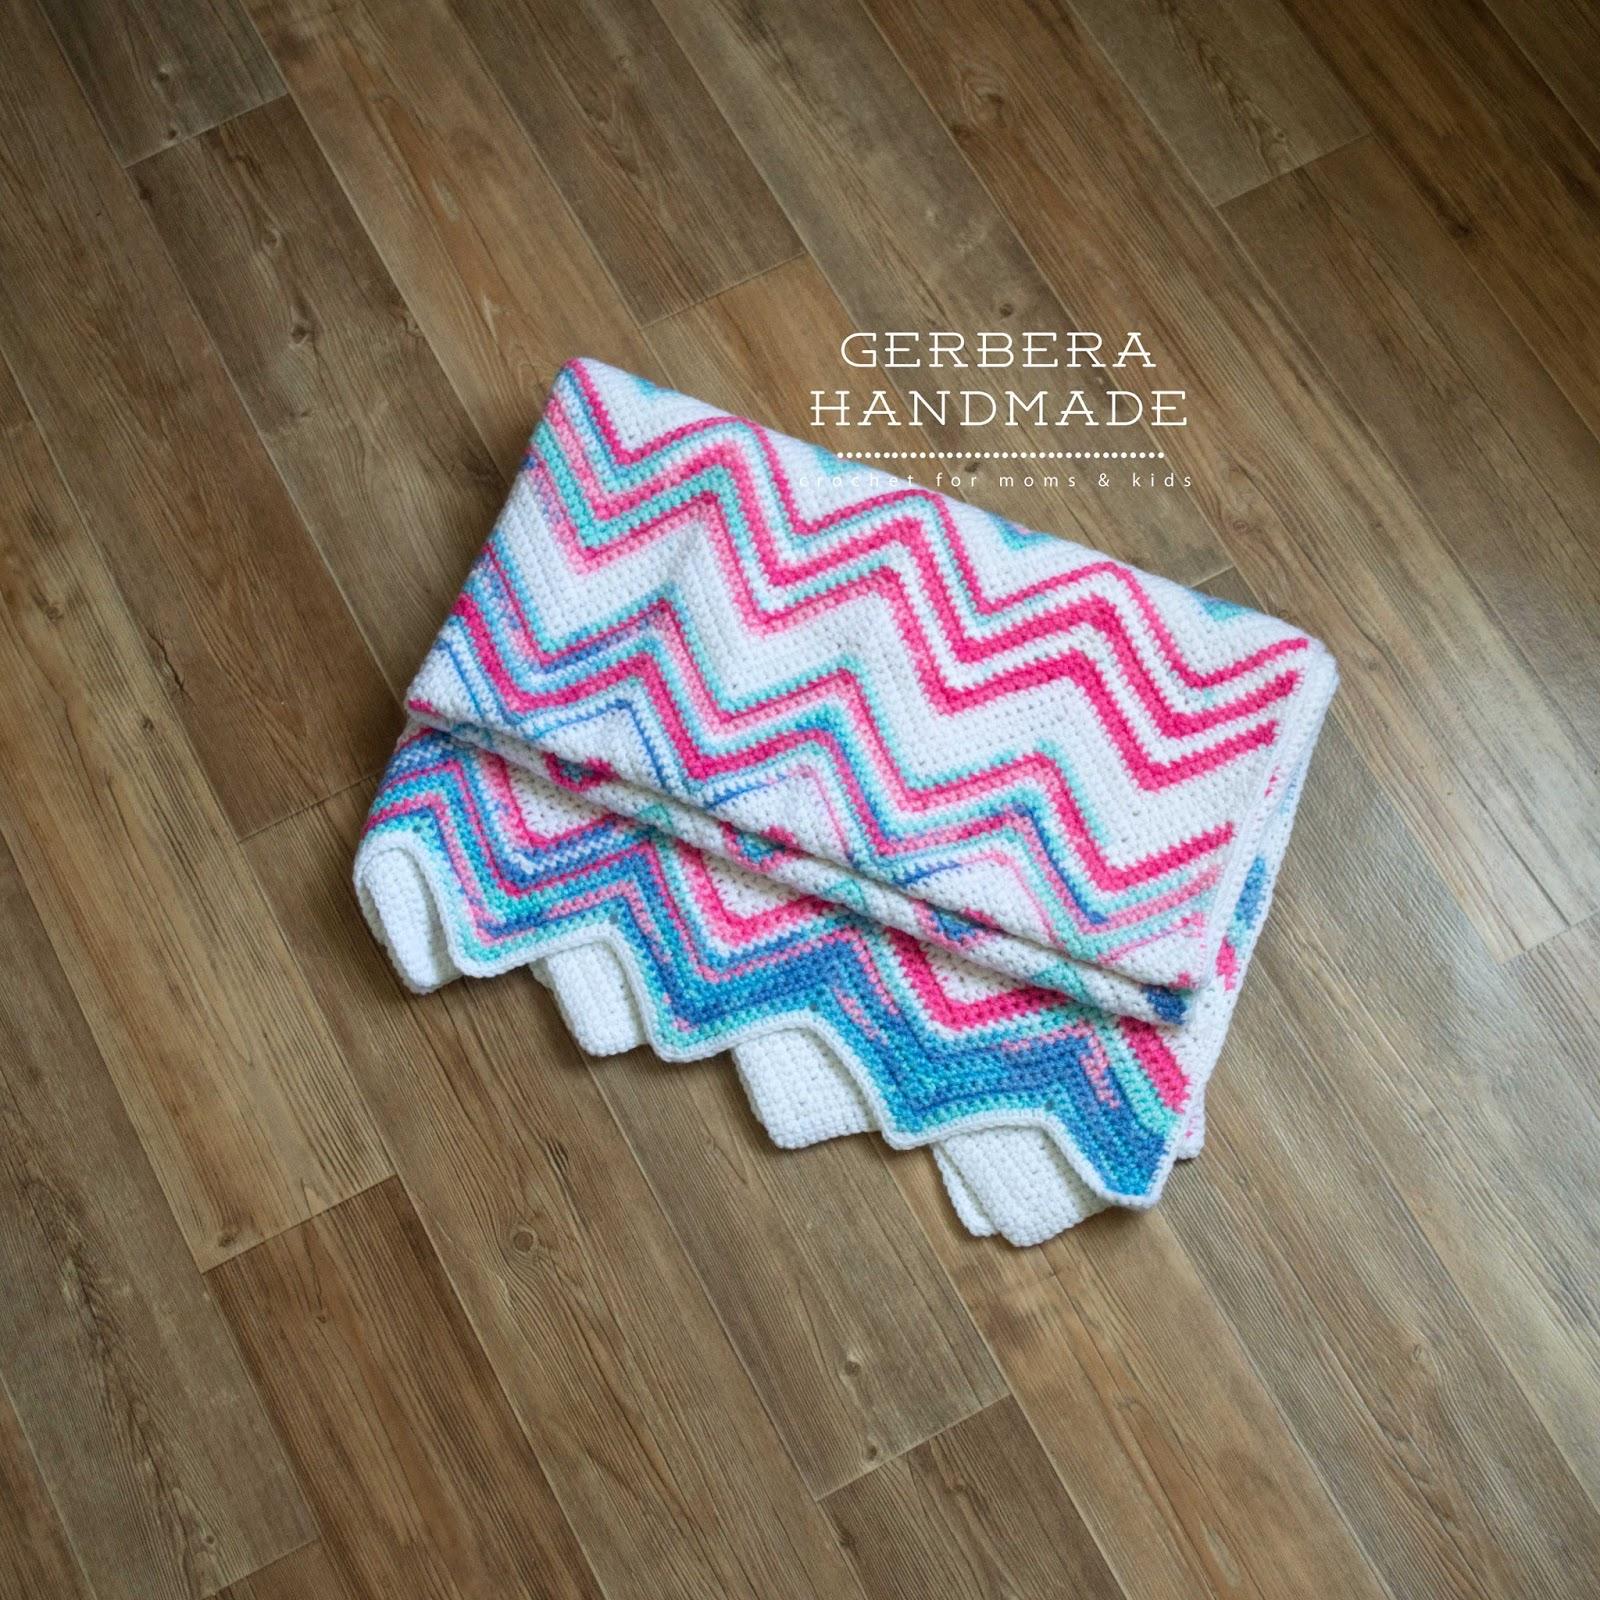 baby blanket, crochet baby blanket, baby, newborn blanket, blanket love, babywearing, плед, плед для новорожденного, плед на выписку, подарок малышу, детский плед, вязаный плед, купить плед, ажурный плед, плед купить, crochet blanket, knitting blanket